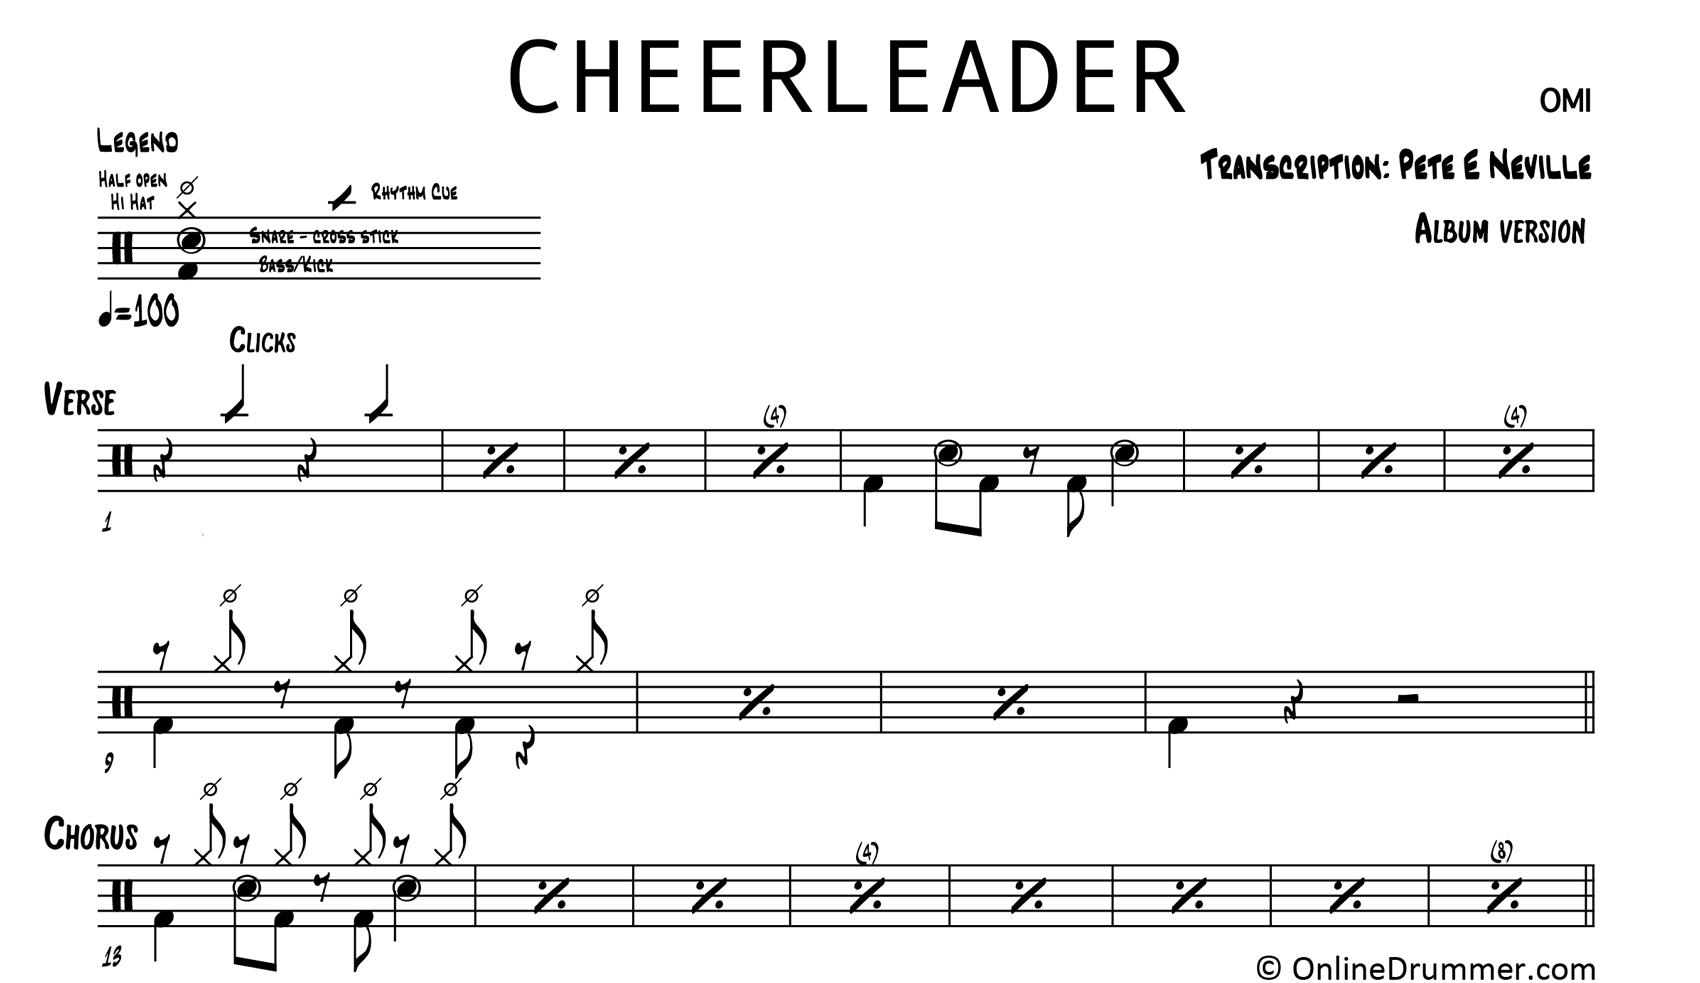 Cheerleader - OMI - Drum Sheet Music